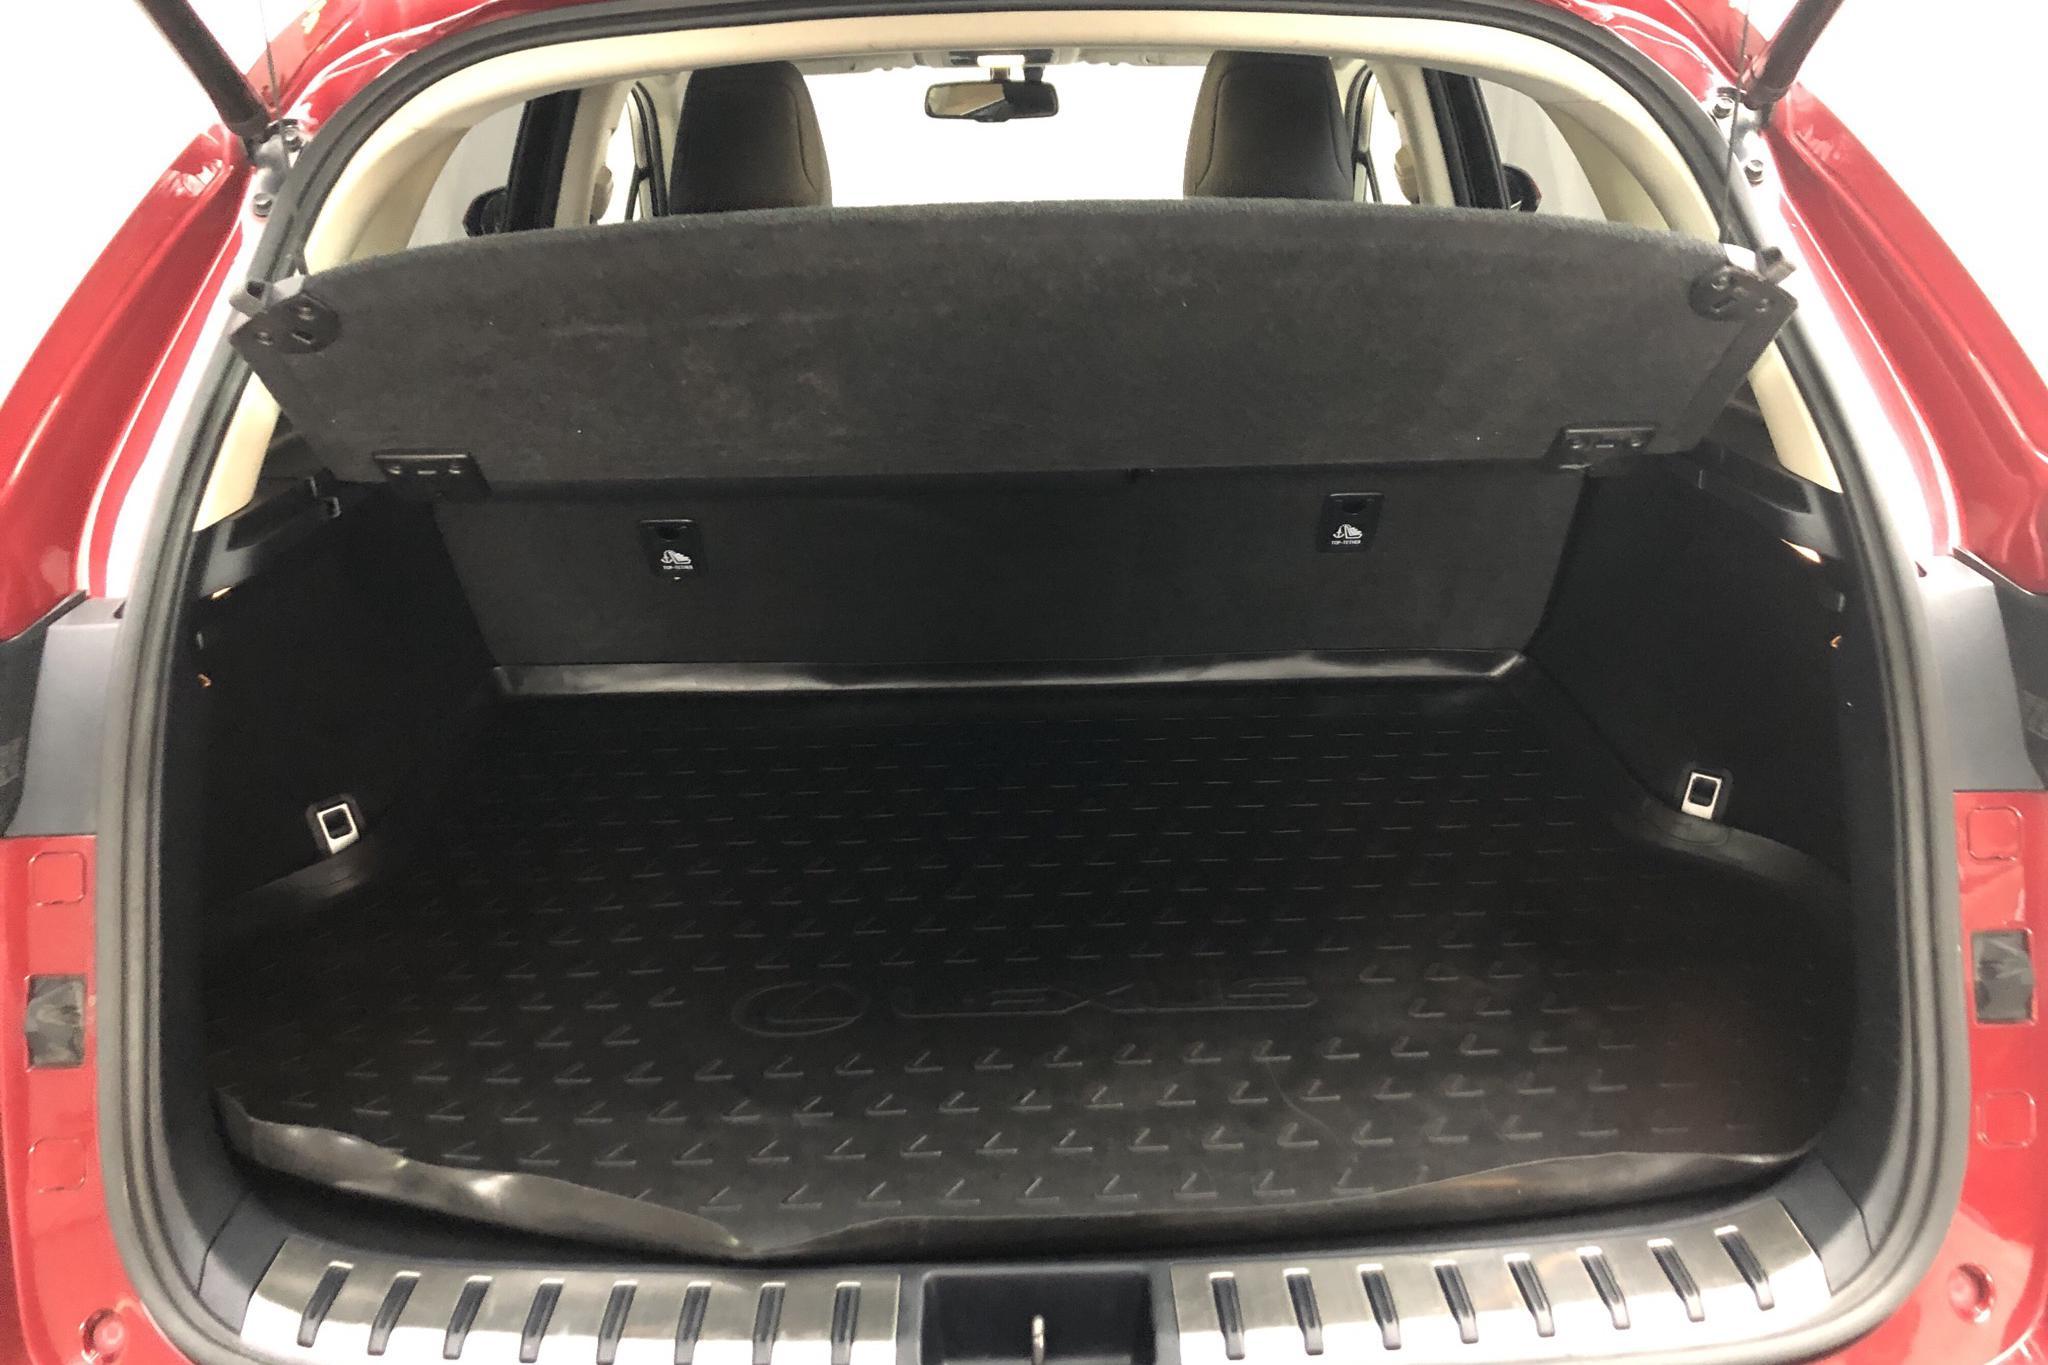 Lexus NX 300h AWD (181hk) - 72 750 km - Automatic - red - 2016